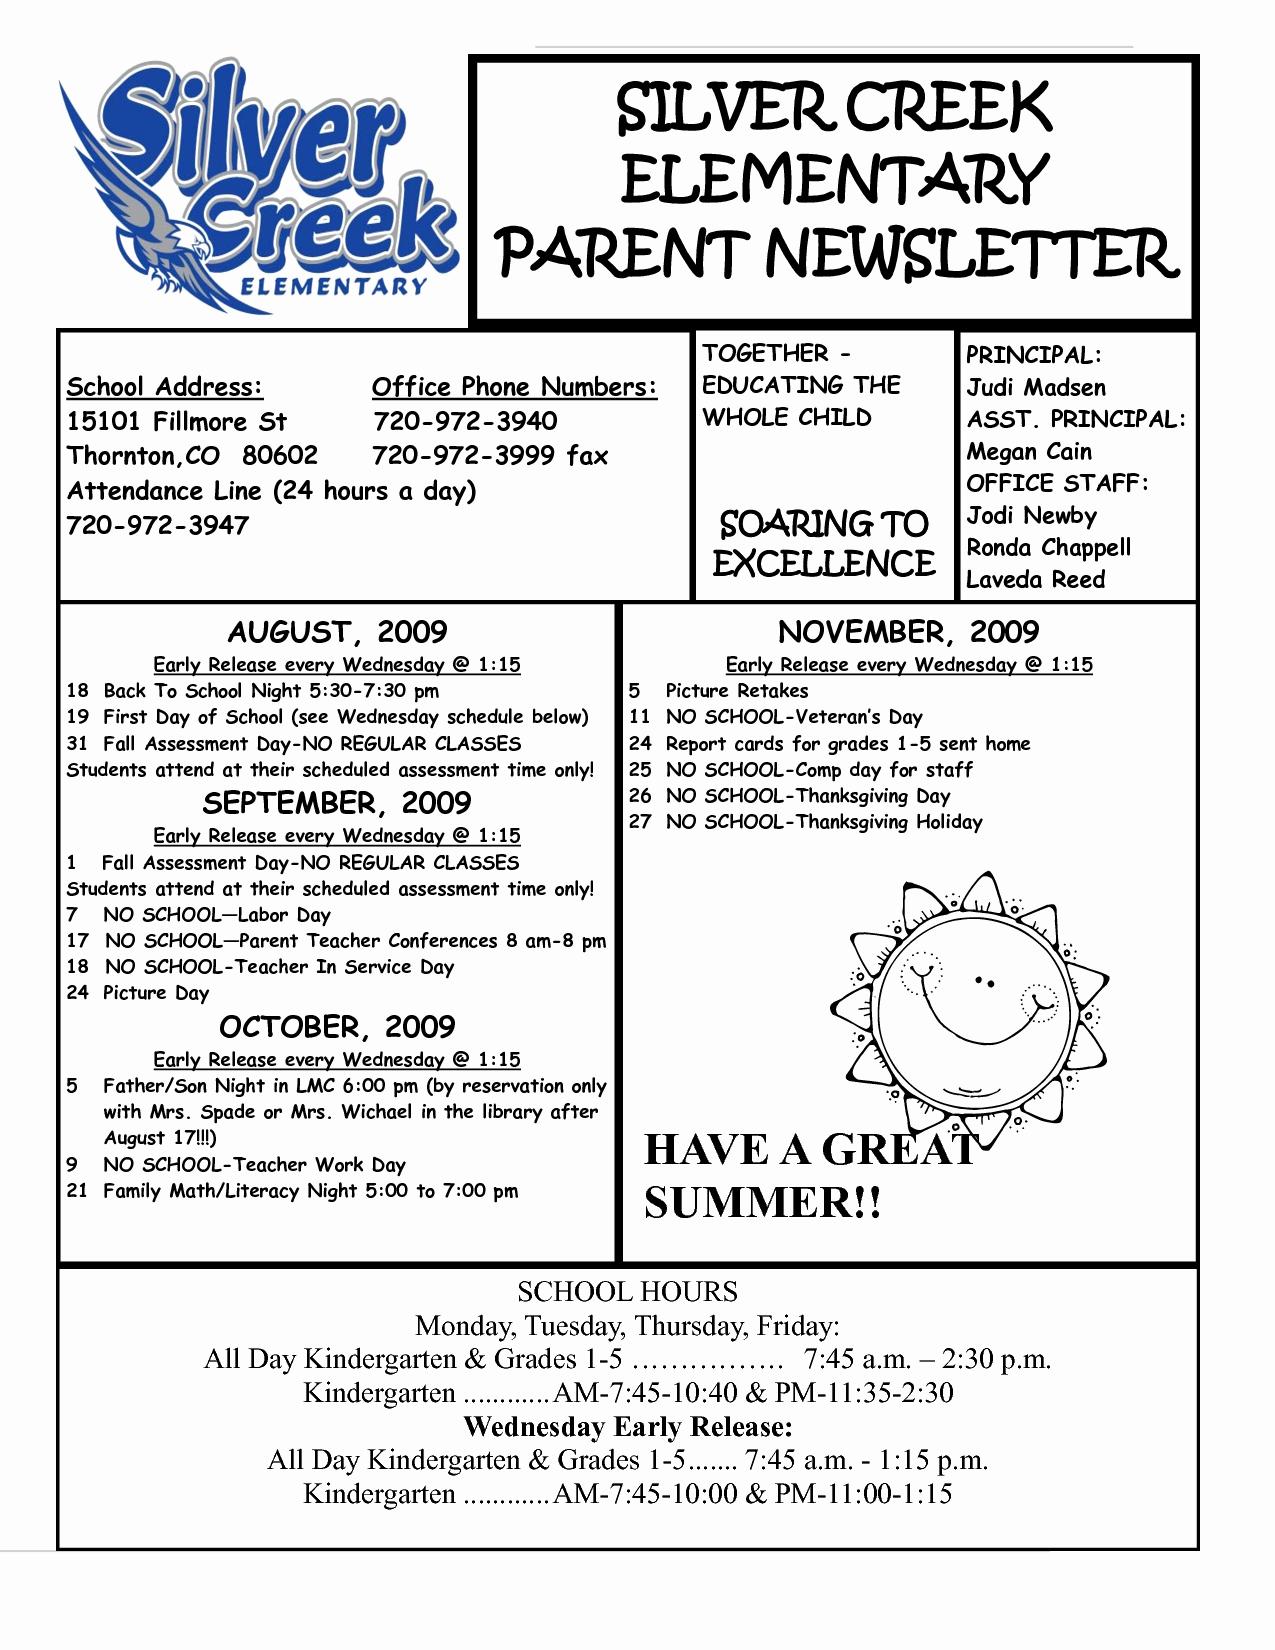 Elementary School Newsletter Template New Best S Of Parent Newsletter Examples Sample Parent